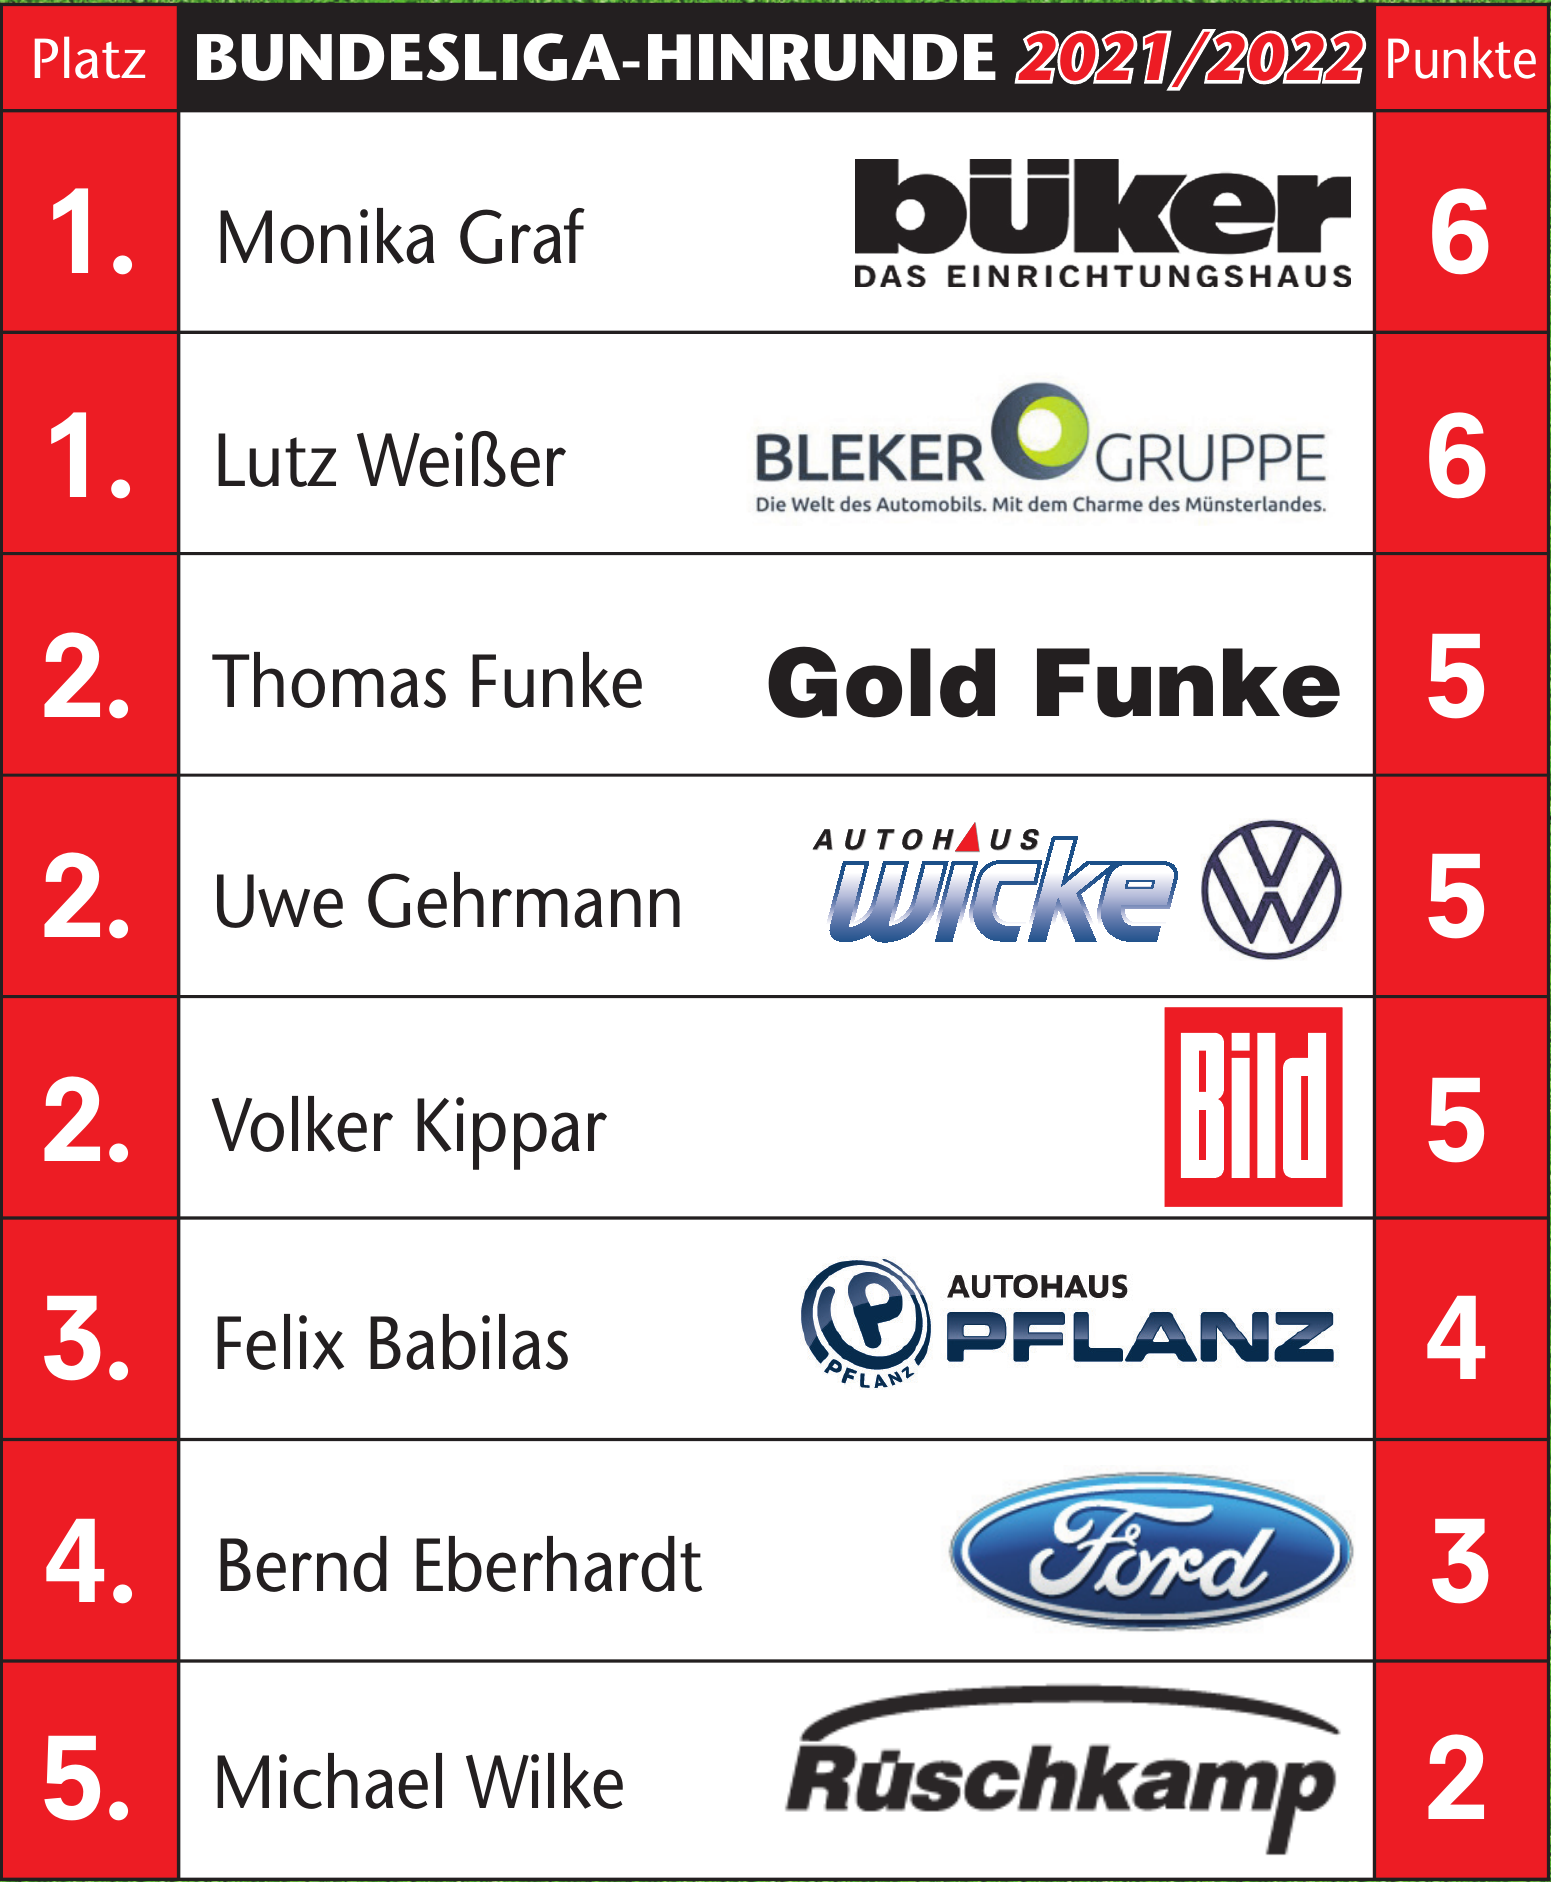 Bundesliga-Tipp 2021/22 Image 2